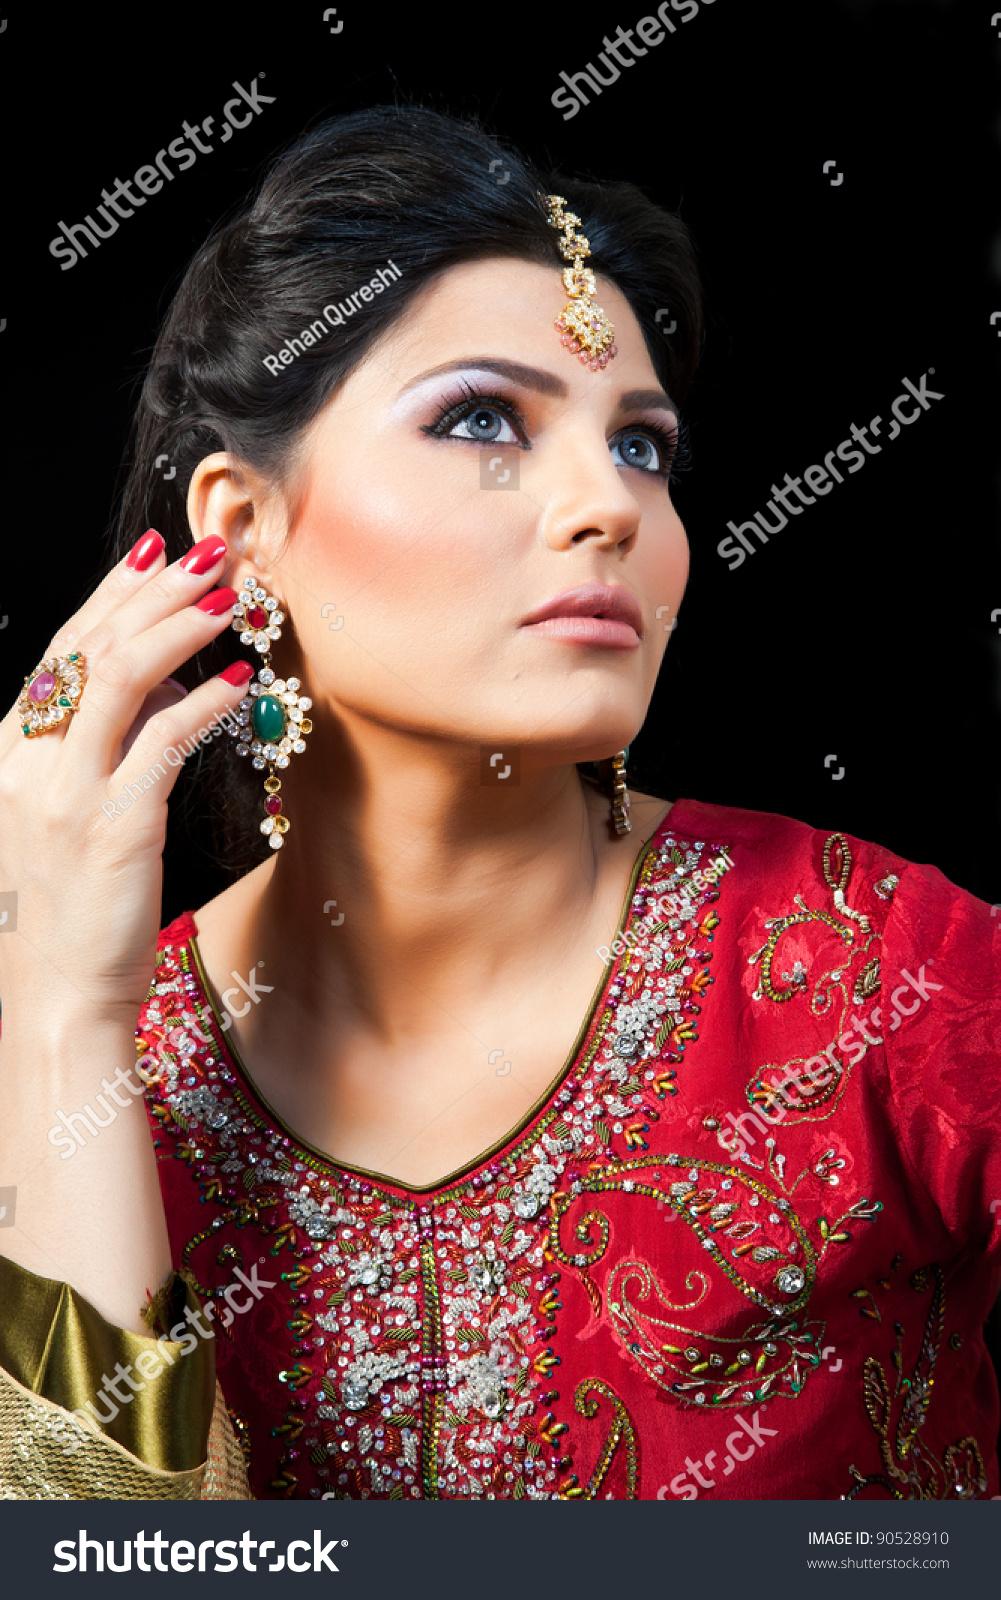 Muslim Indian Bride Wearing Red Bridal Stock Photo (Royalty Free ...